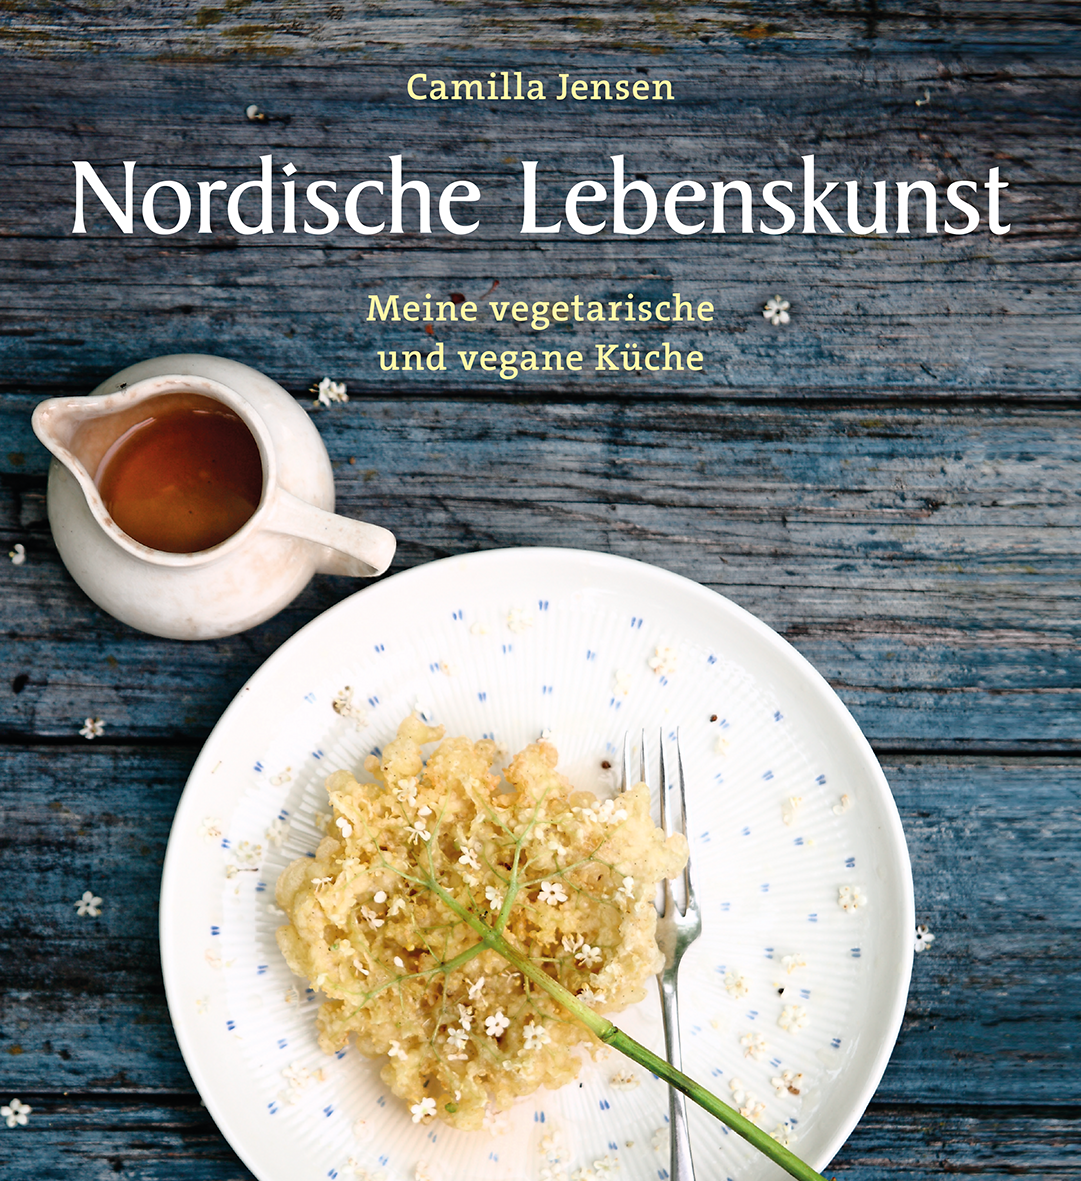 Nordische Lebenskunst | Verlag Freies Geistesleben